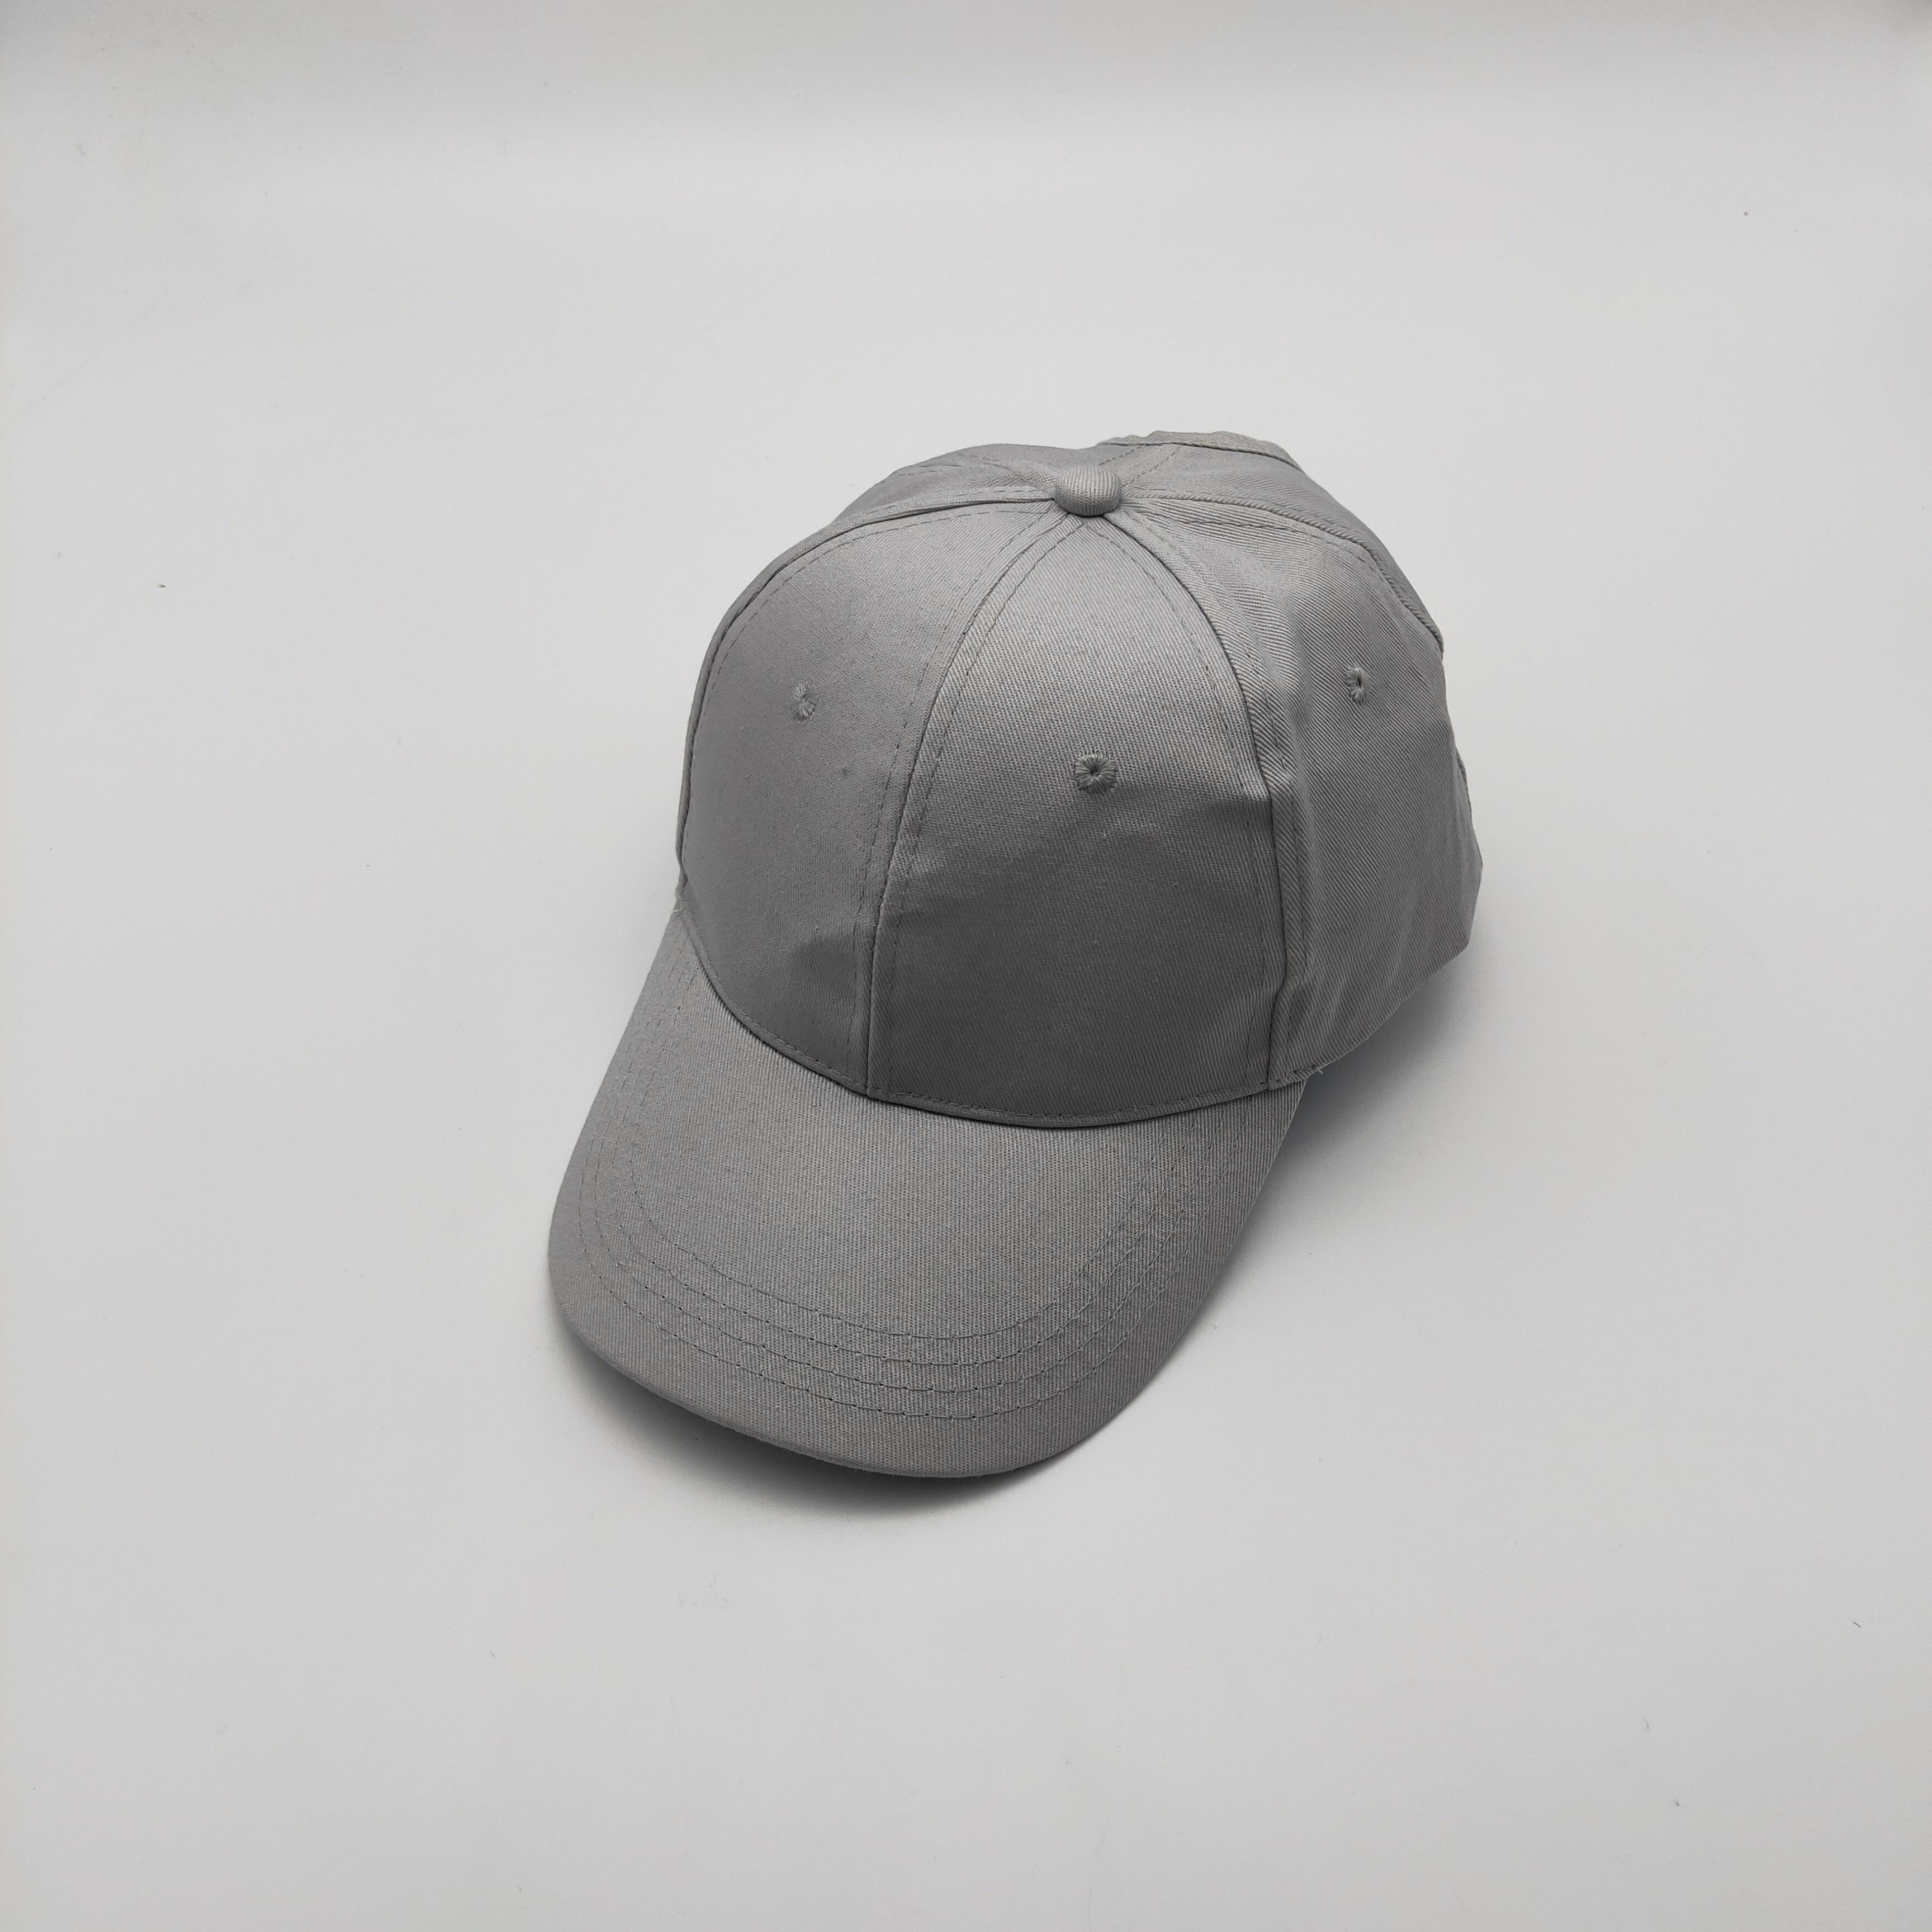 Adjustable Snapback Hat Cap with Black Embroidered Recaro Logo